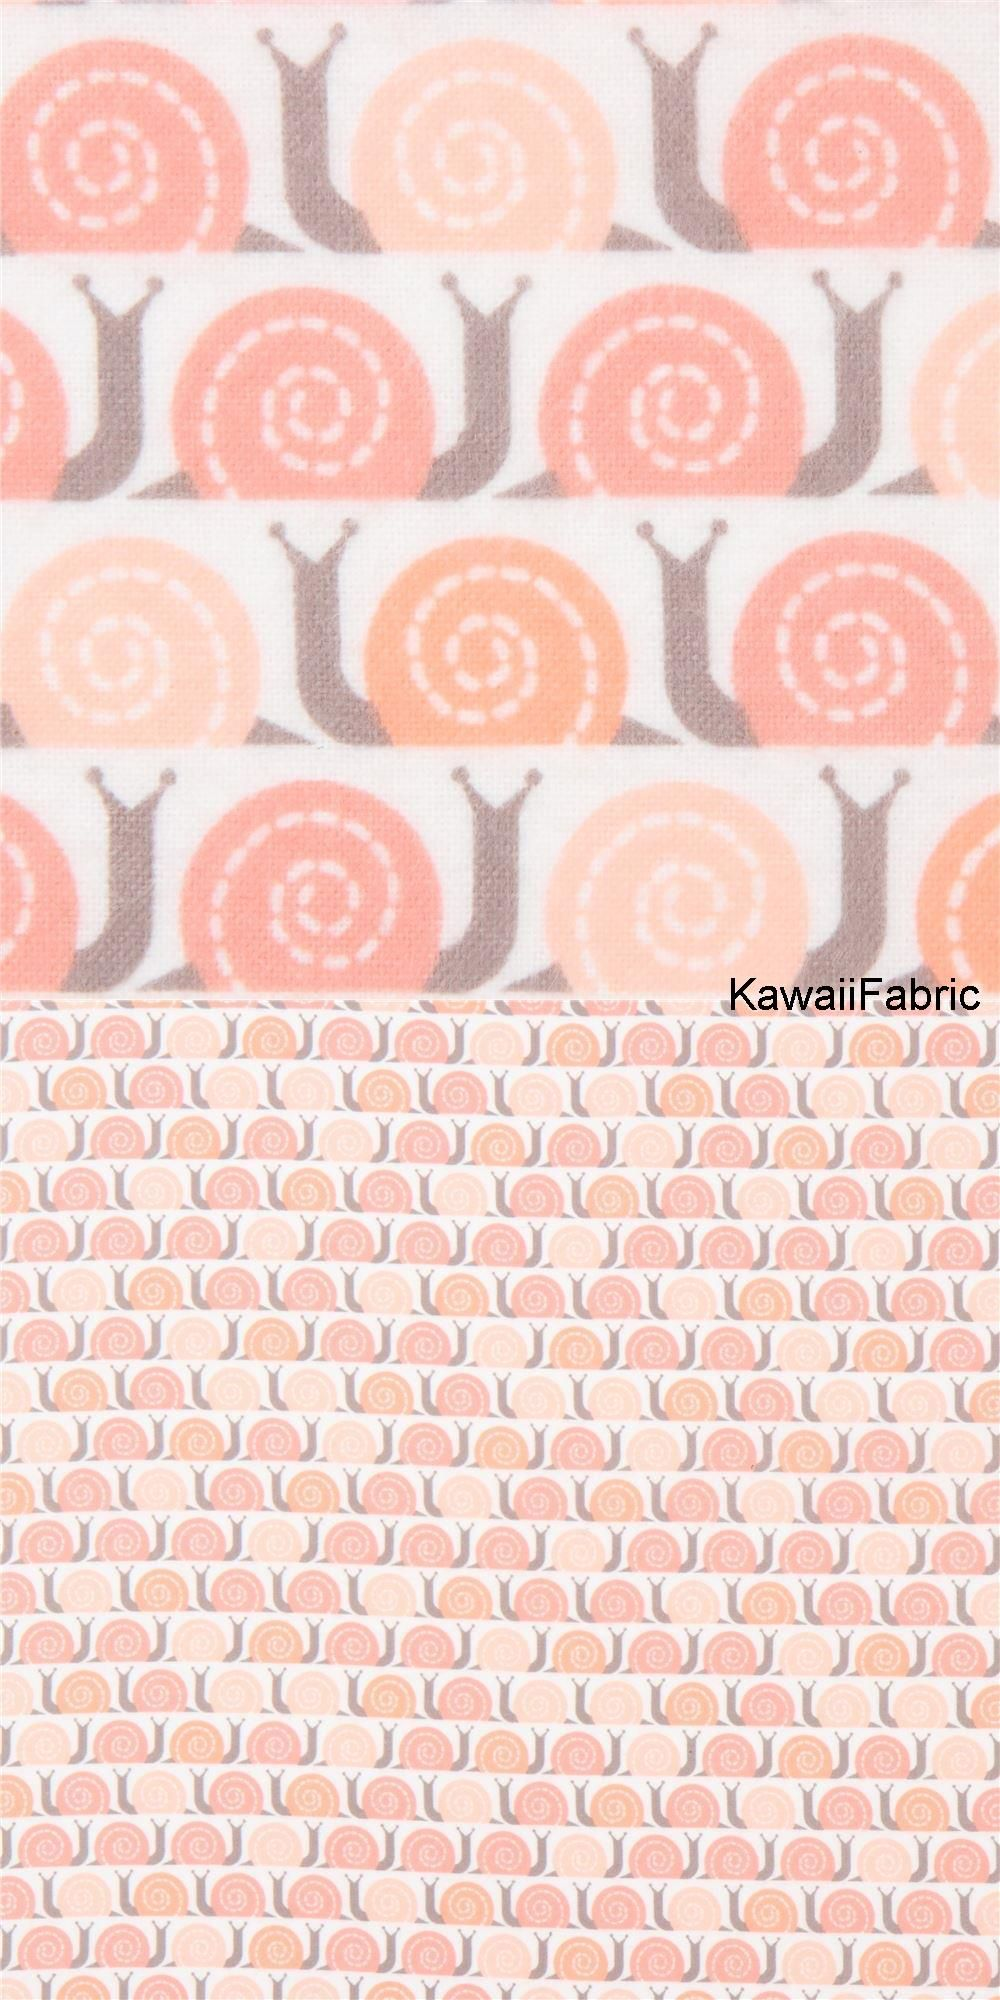 Birch Fabrics Sea Snails Knit